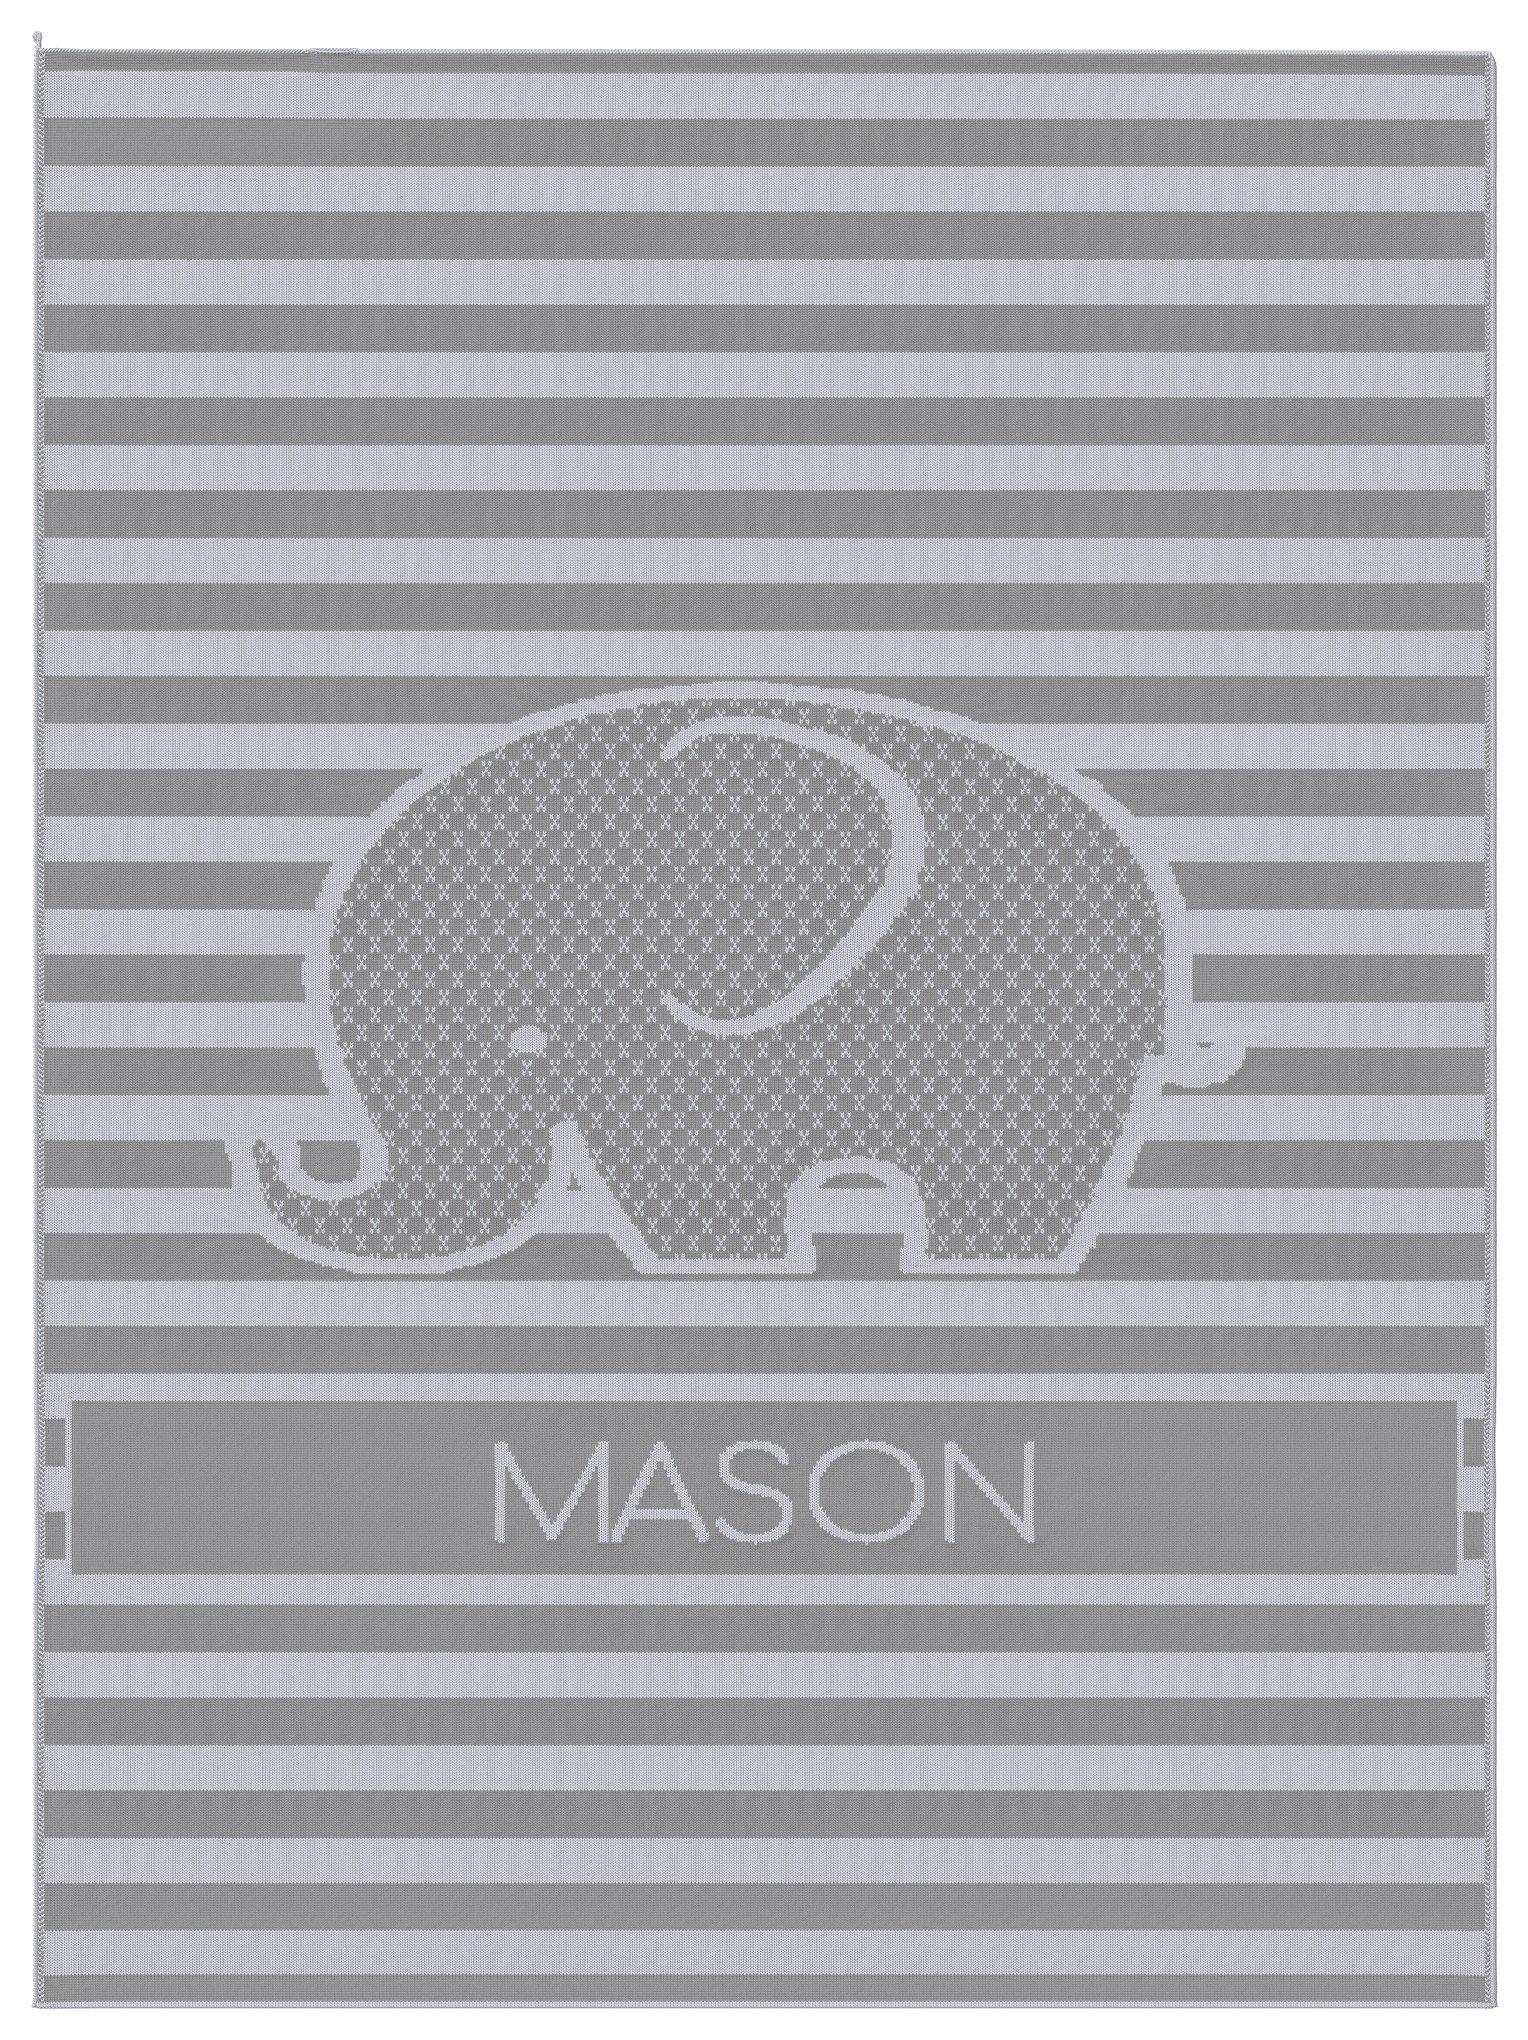 Emji Luxury Knit Baby Blanket with Elephant, Customized Name Stroller Blanket, 100% Cashwool Merino Wool, Grey and White